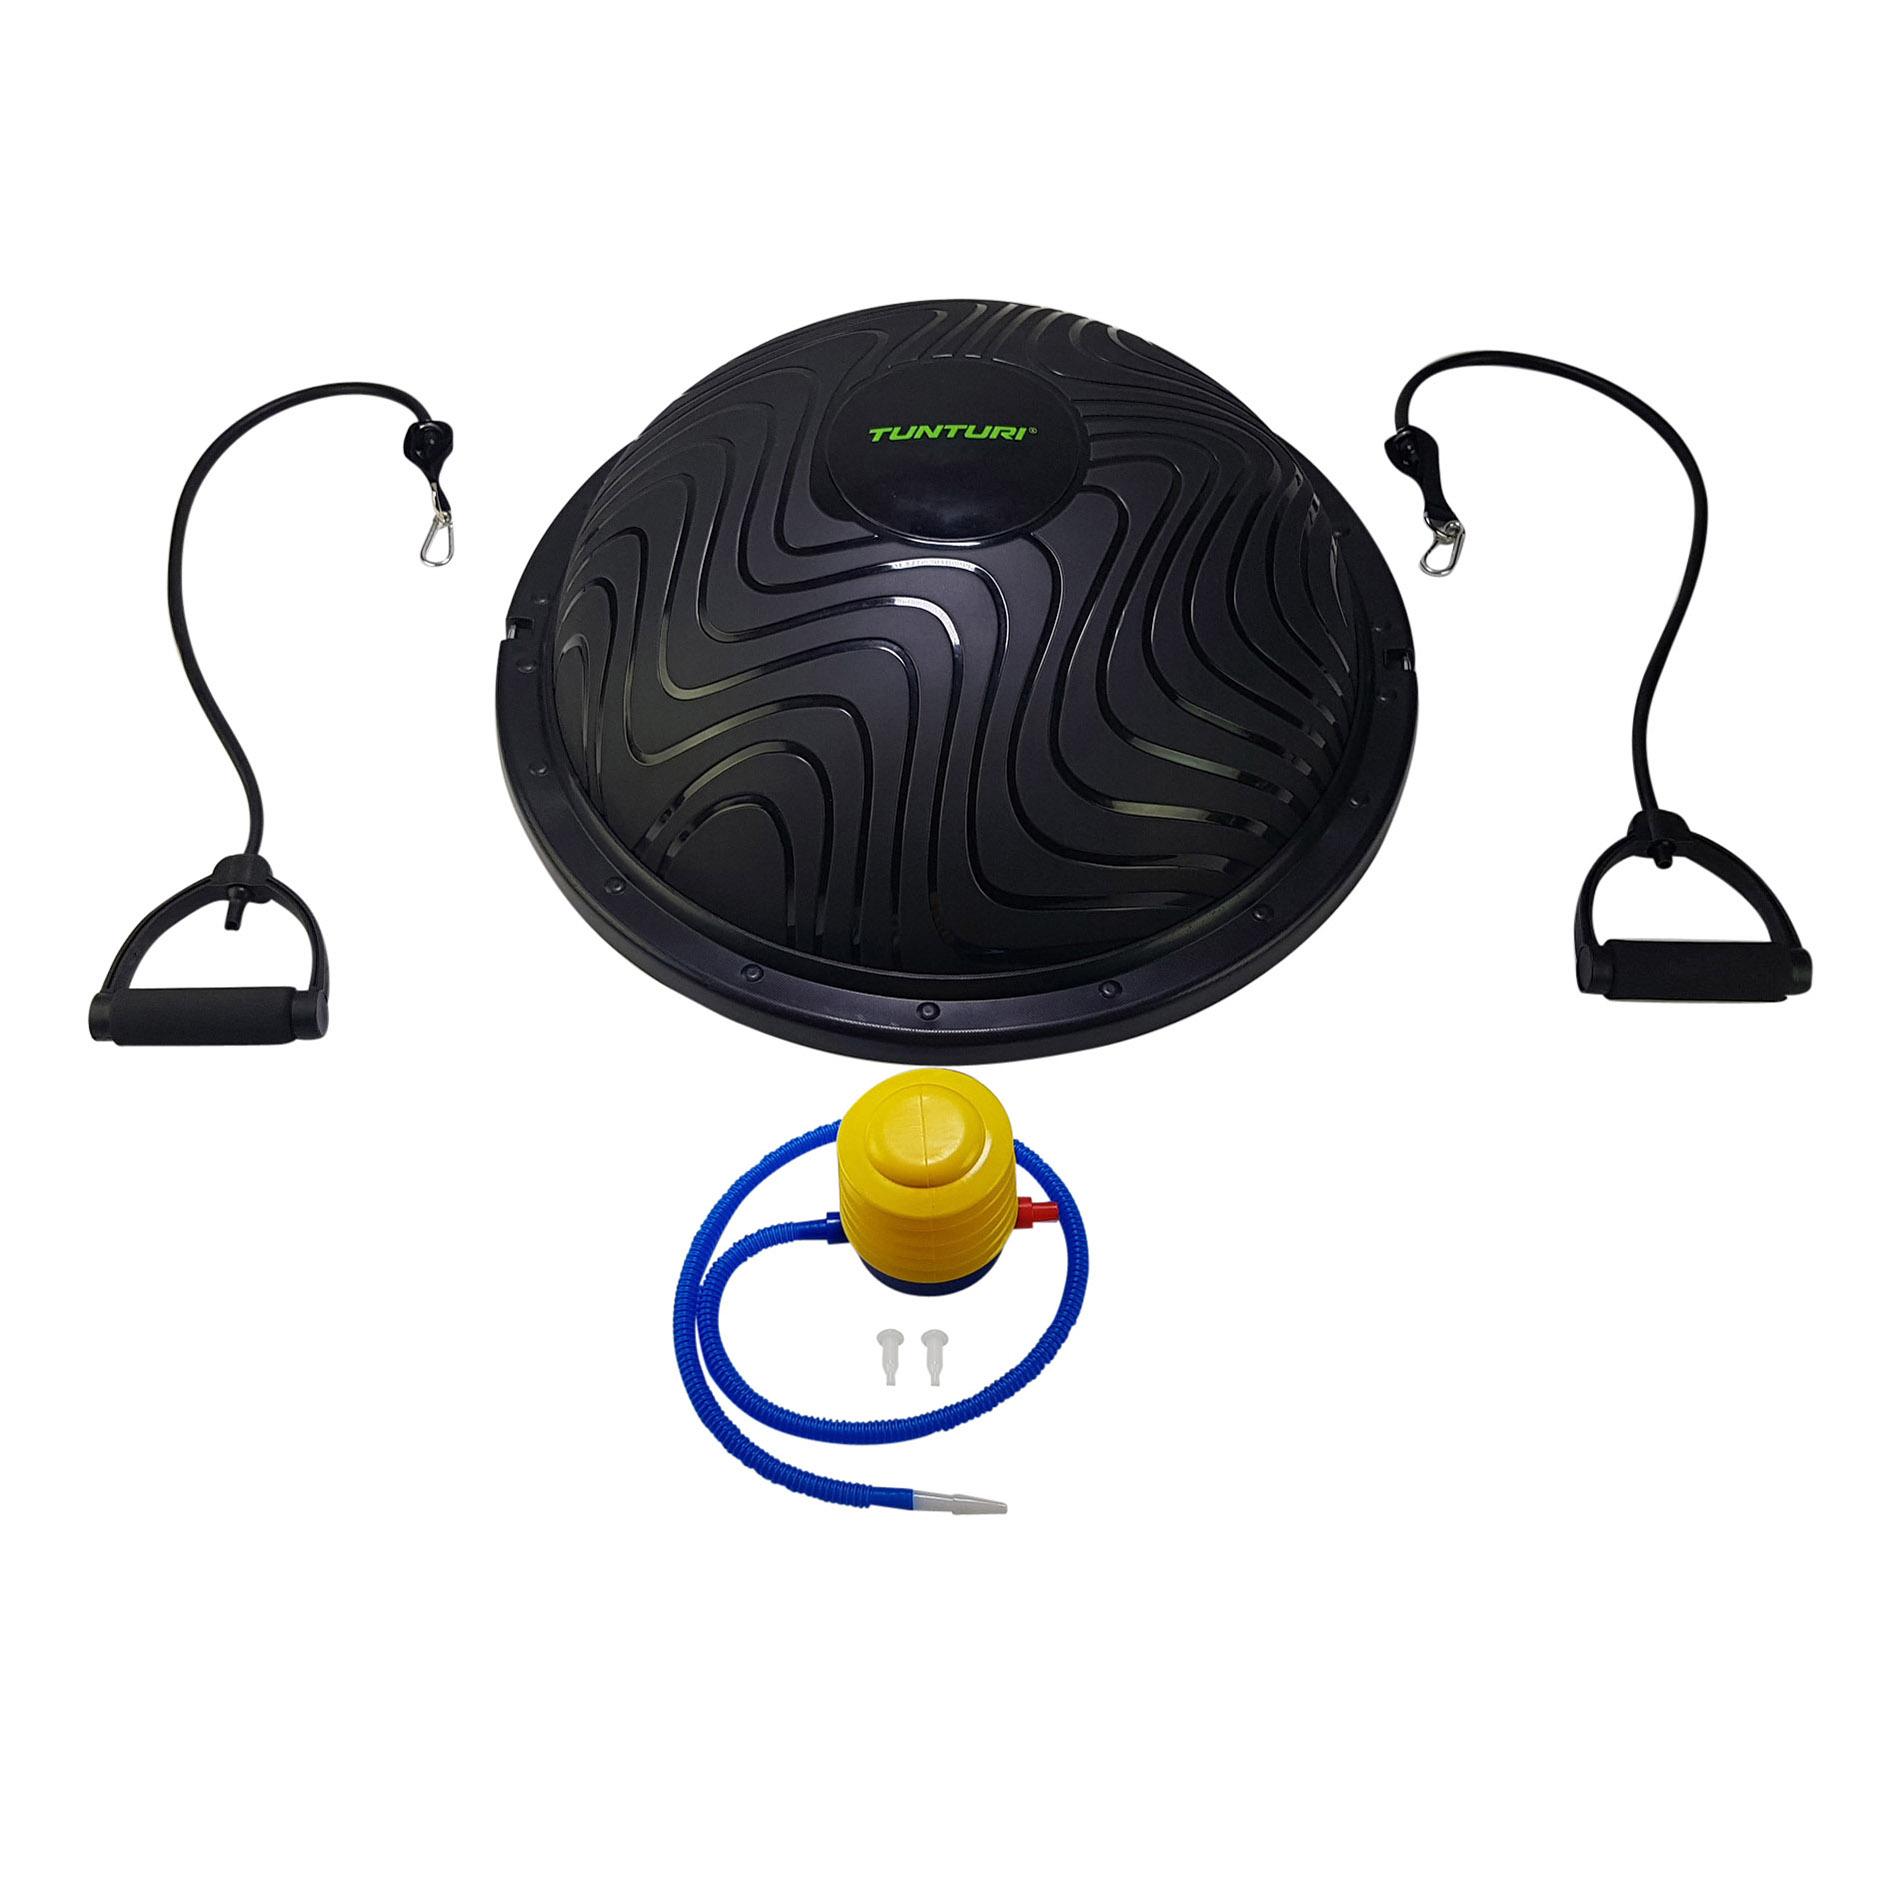 Balanstrainer - Balance trainer - Pro